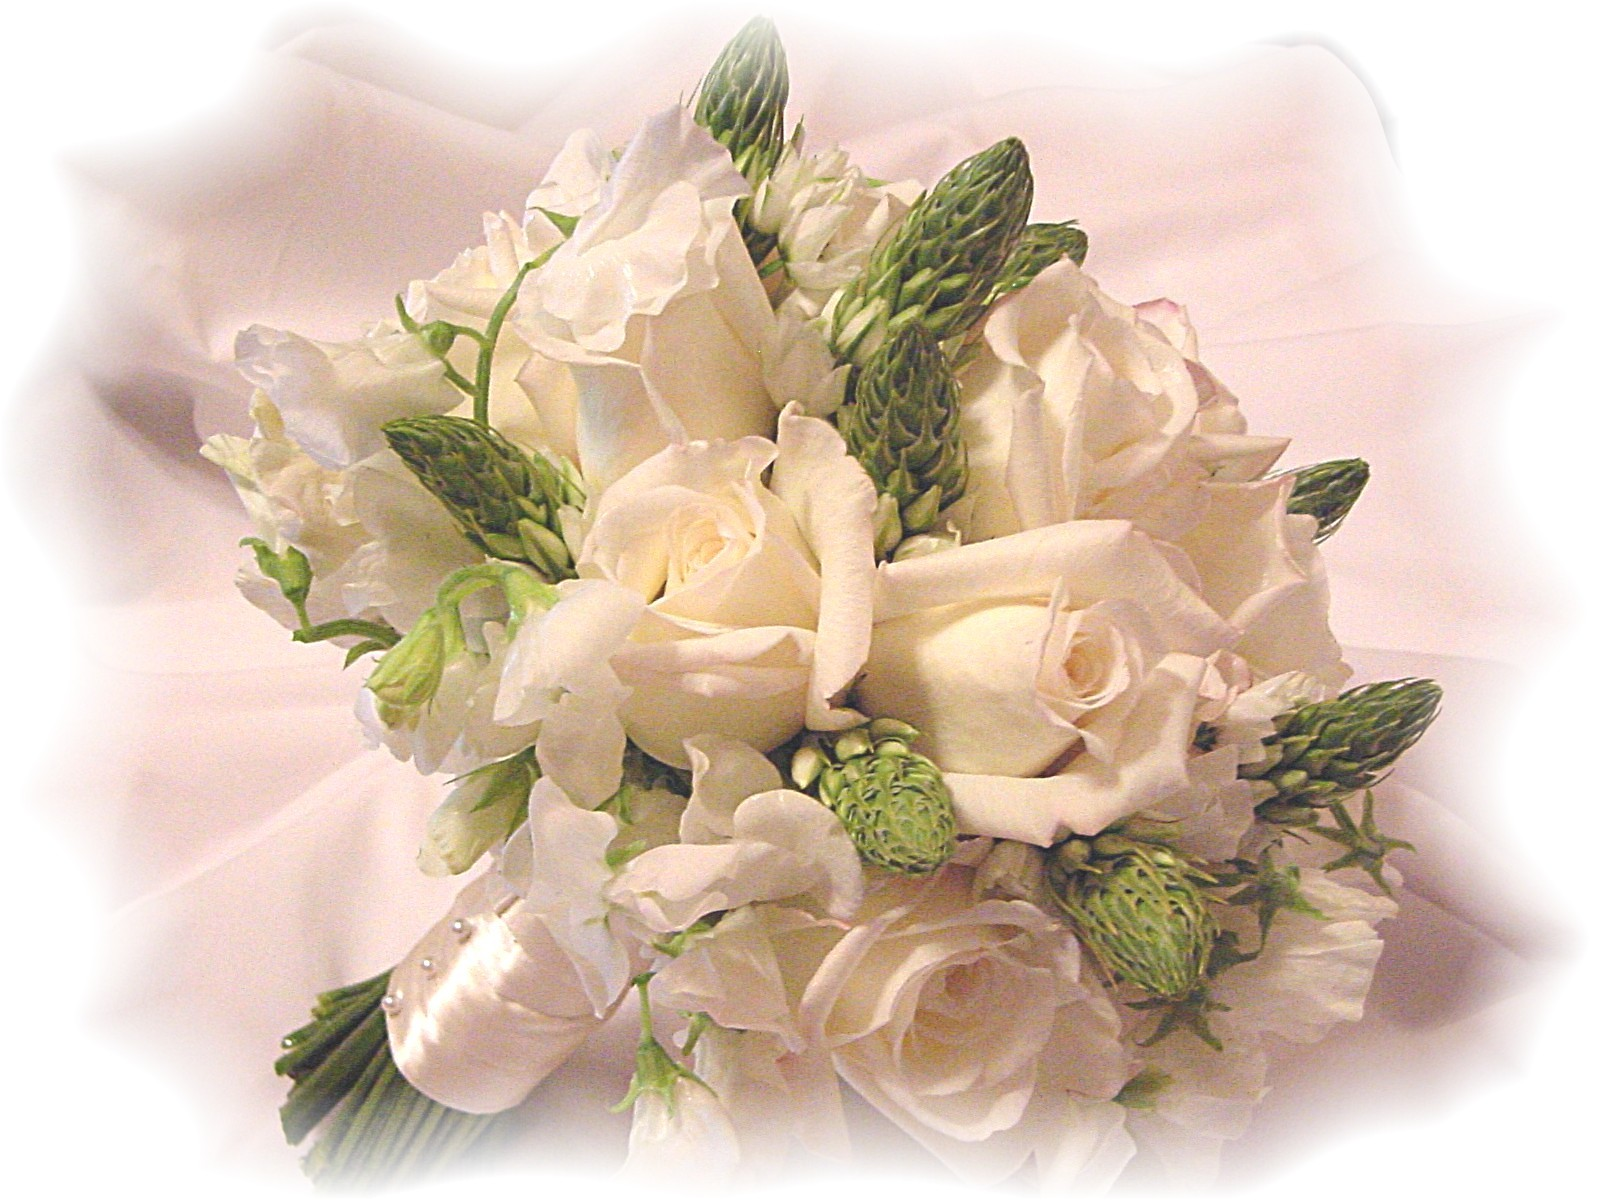 DIY Wedding Flowers Blossom into Savings for Brides